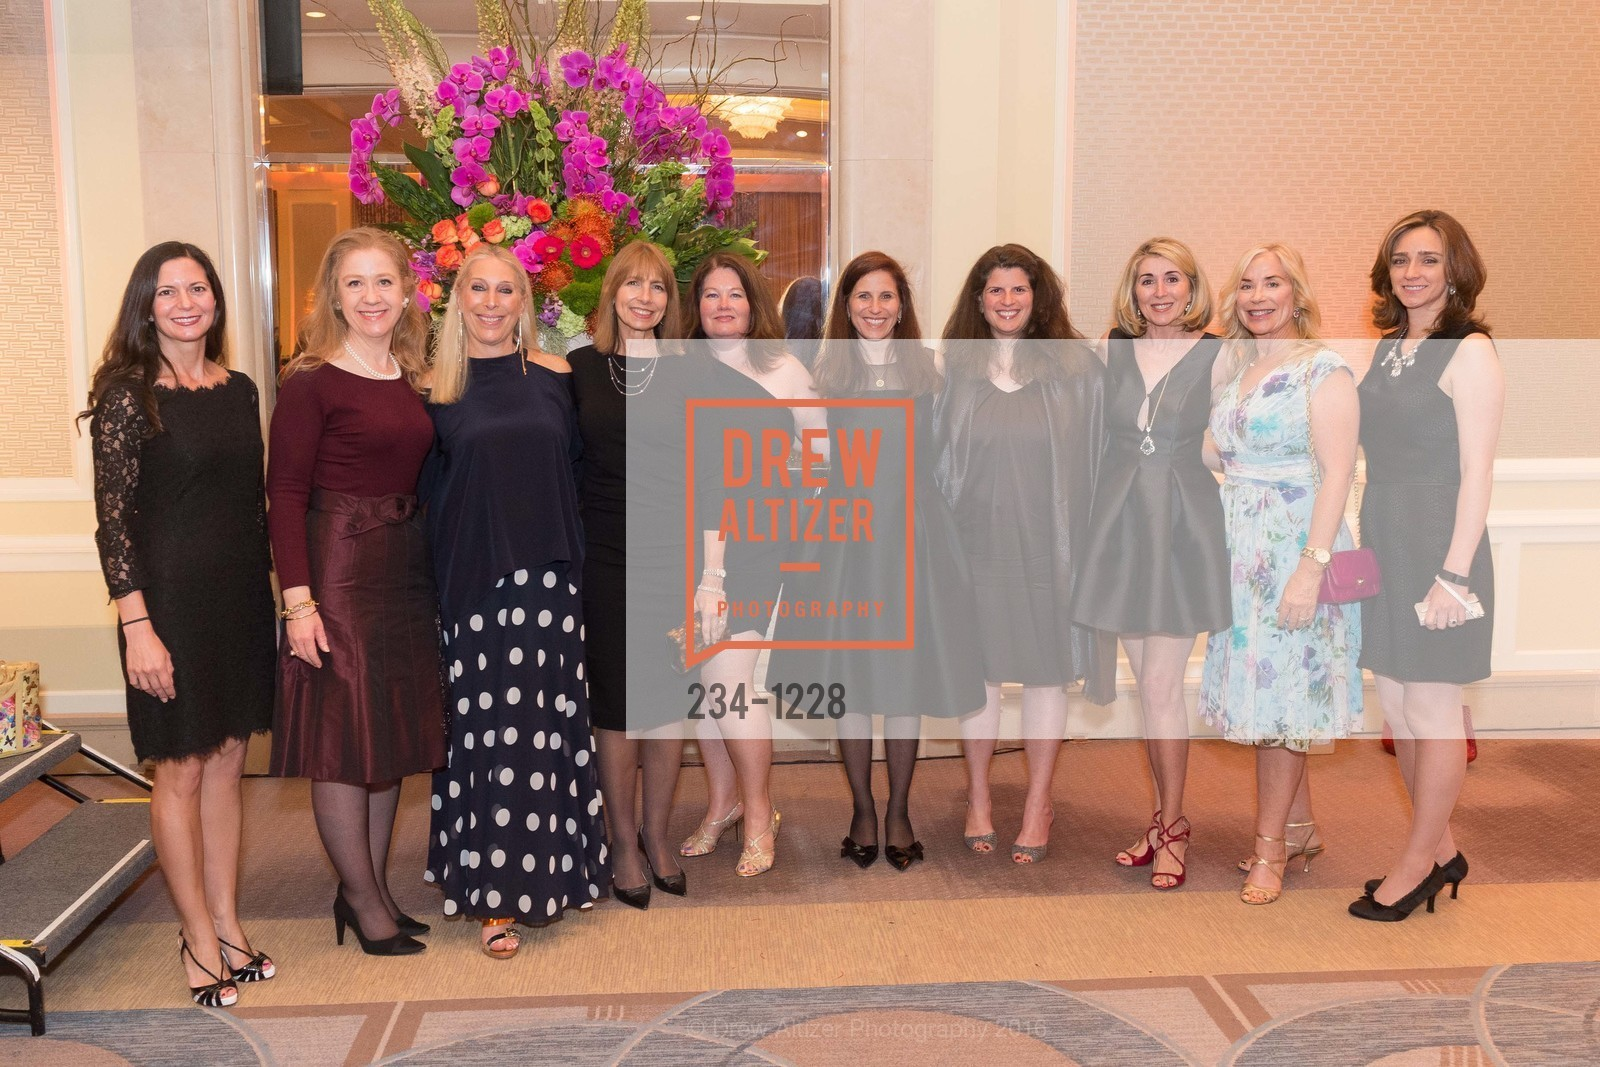 Selin Wold, Carol Benz, Betsy Linder, Carol Louie, Michelle Gilman-Jasen, Amy Wender-Hoch, Pam Zaragoza, Photo #234-1228